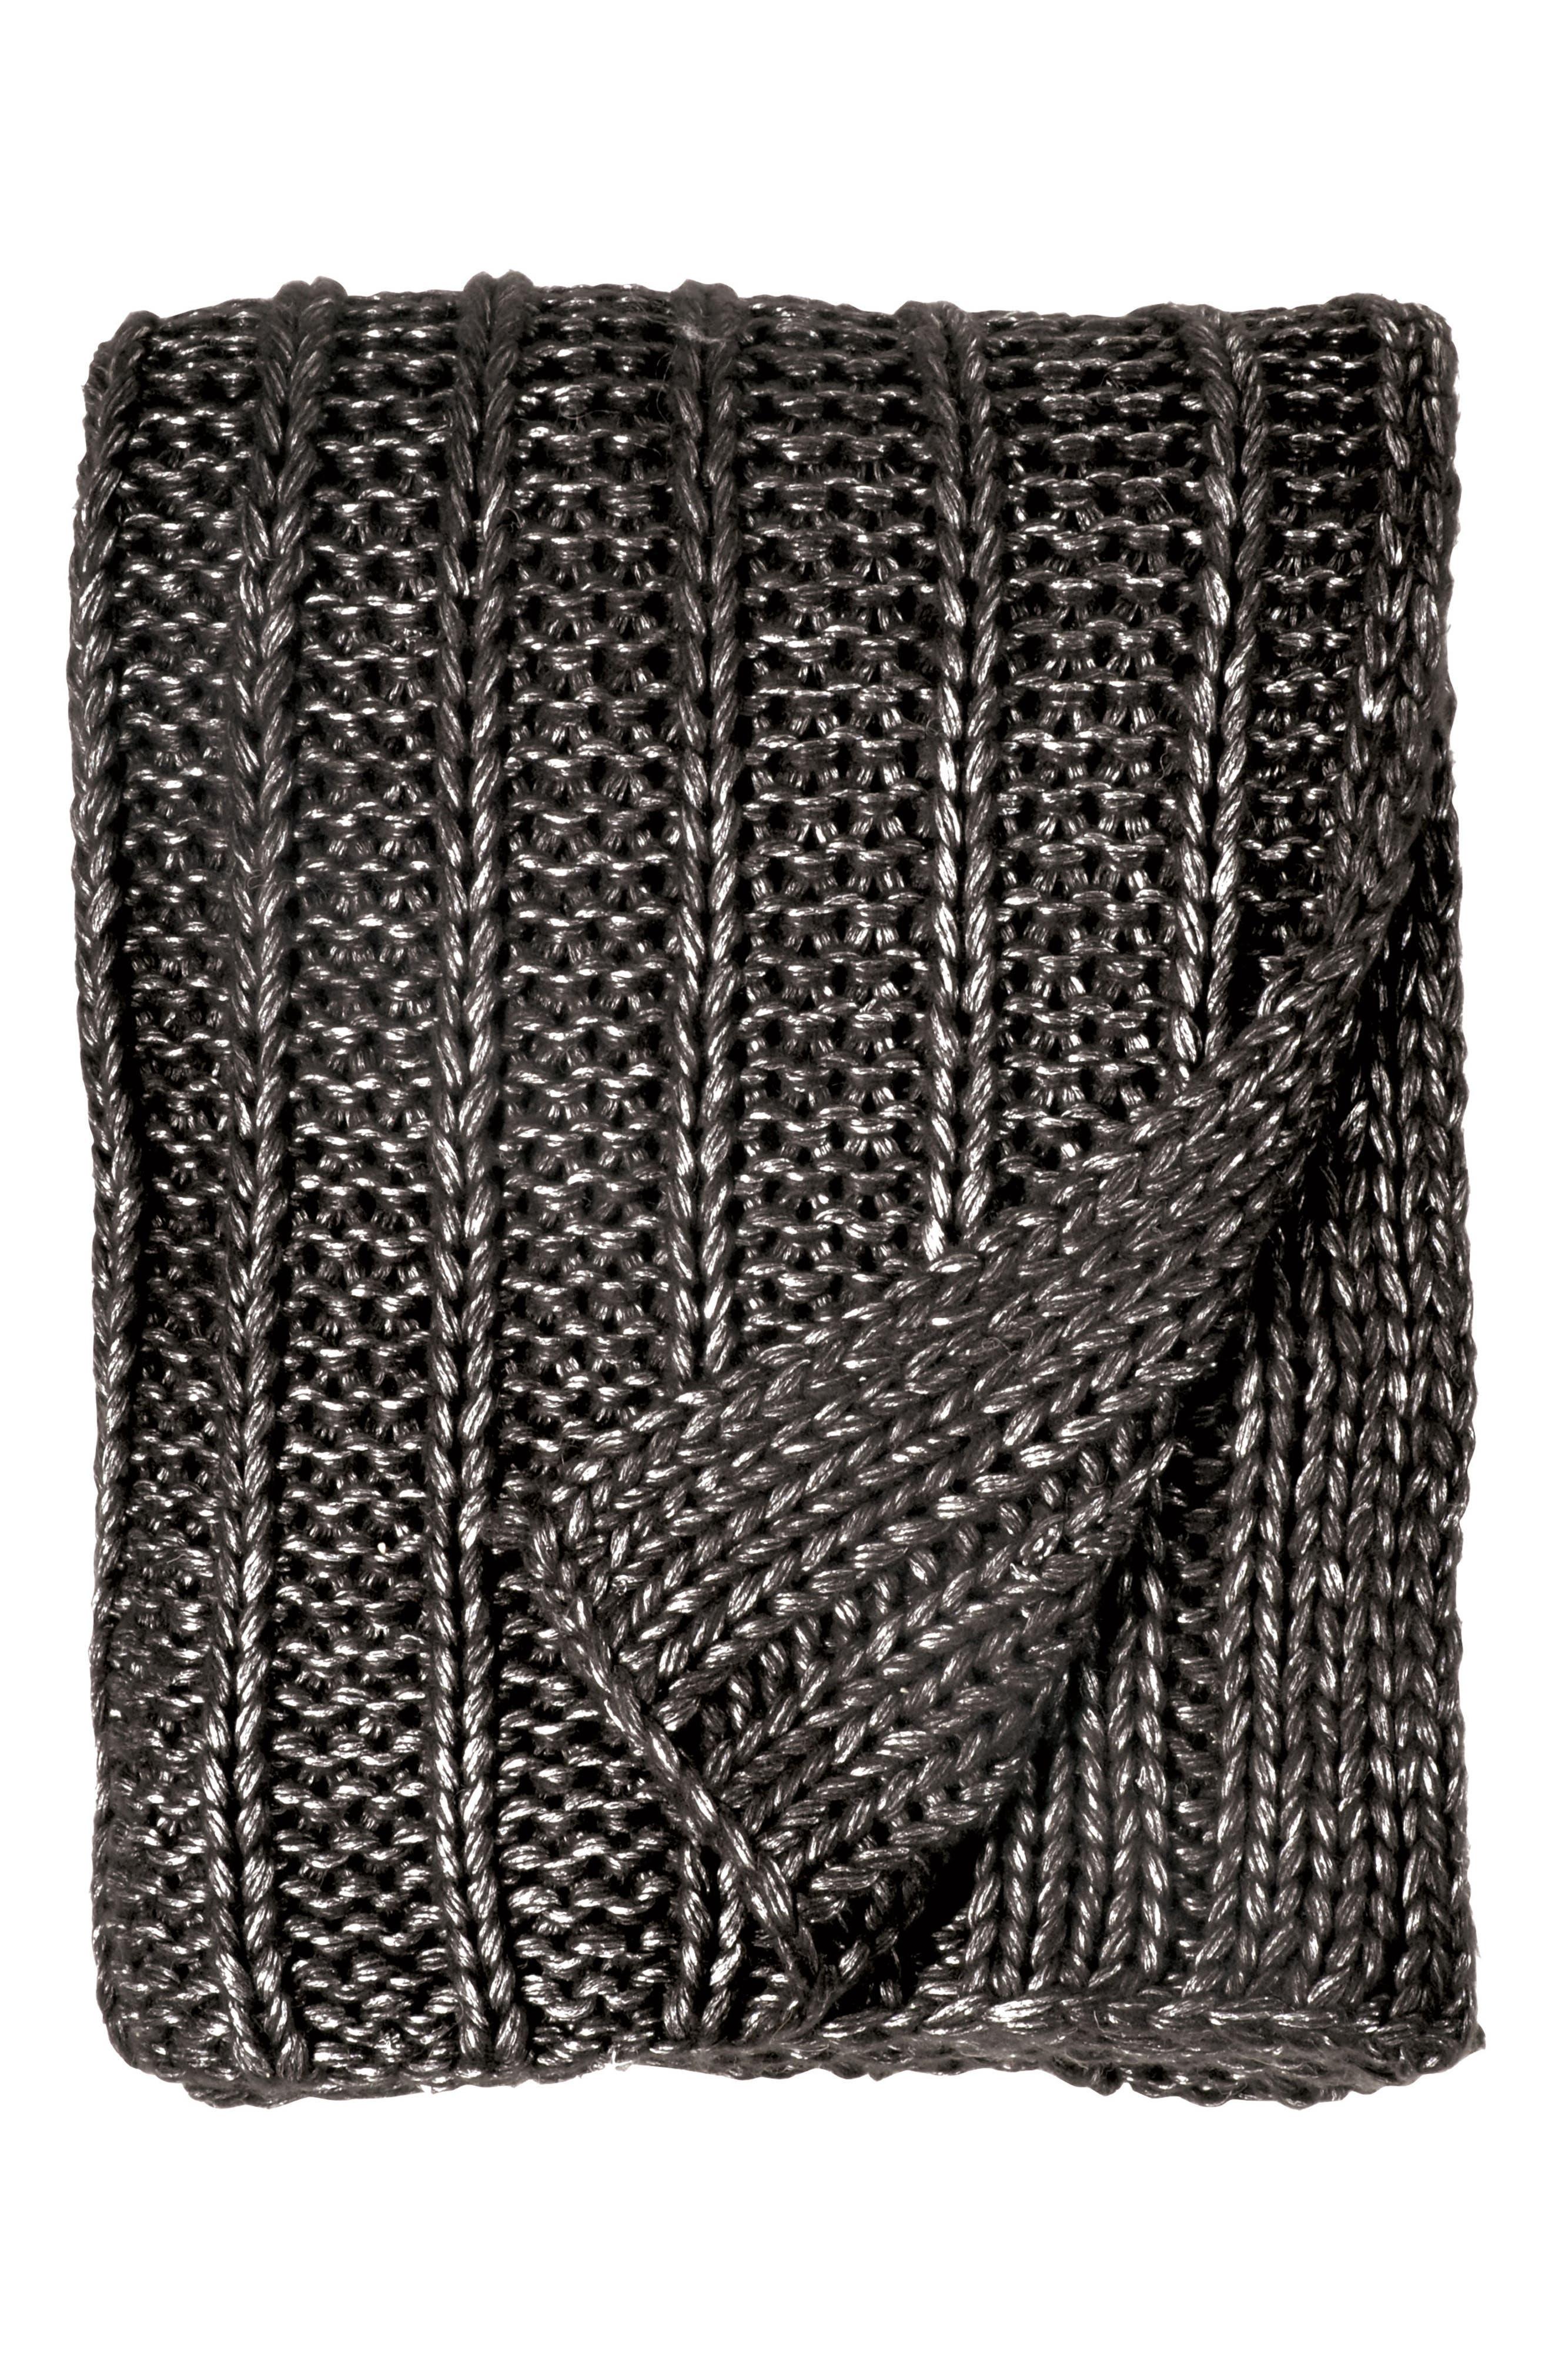 Metallic Rib Knit Throw,                             Main thumbnail 1, color,                             Charcoal